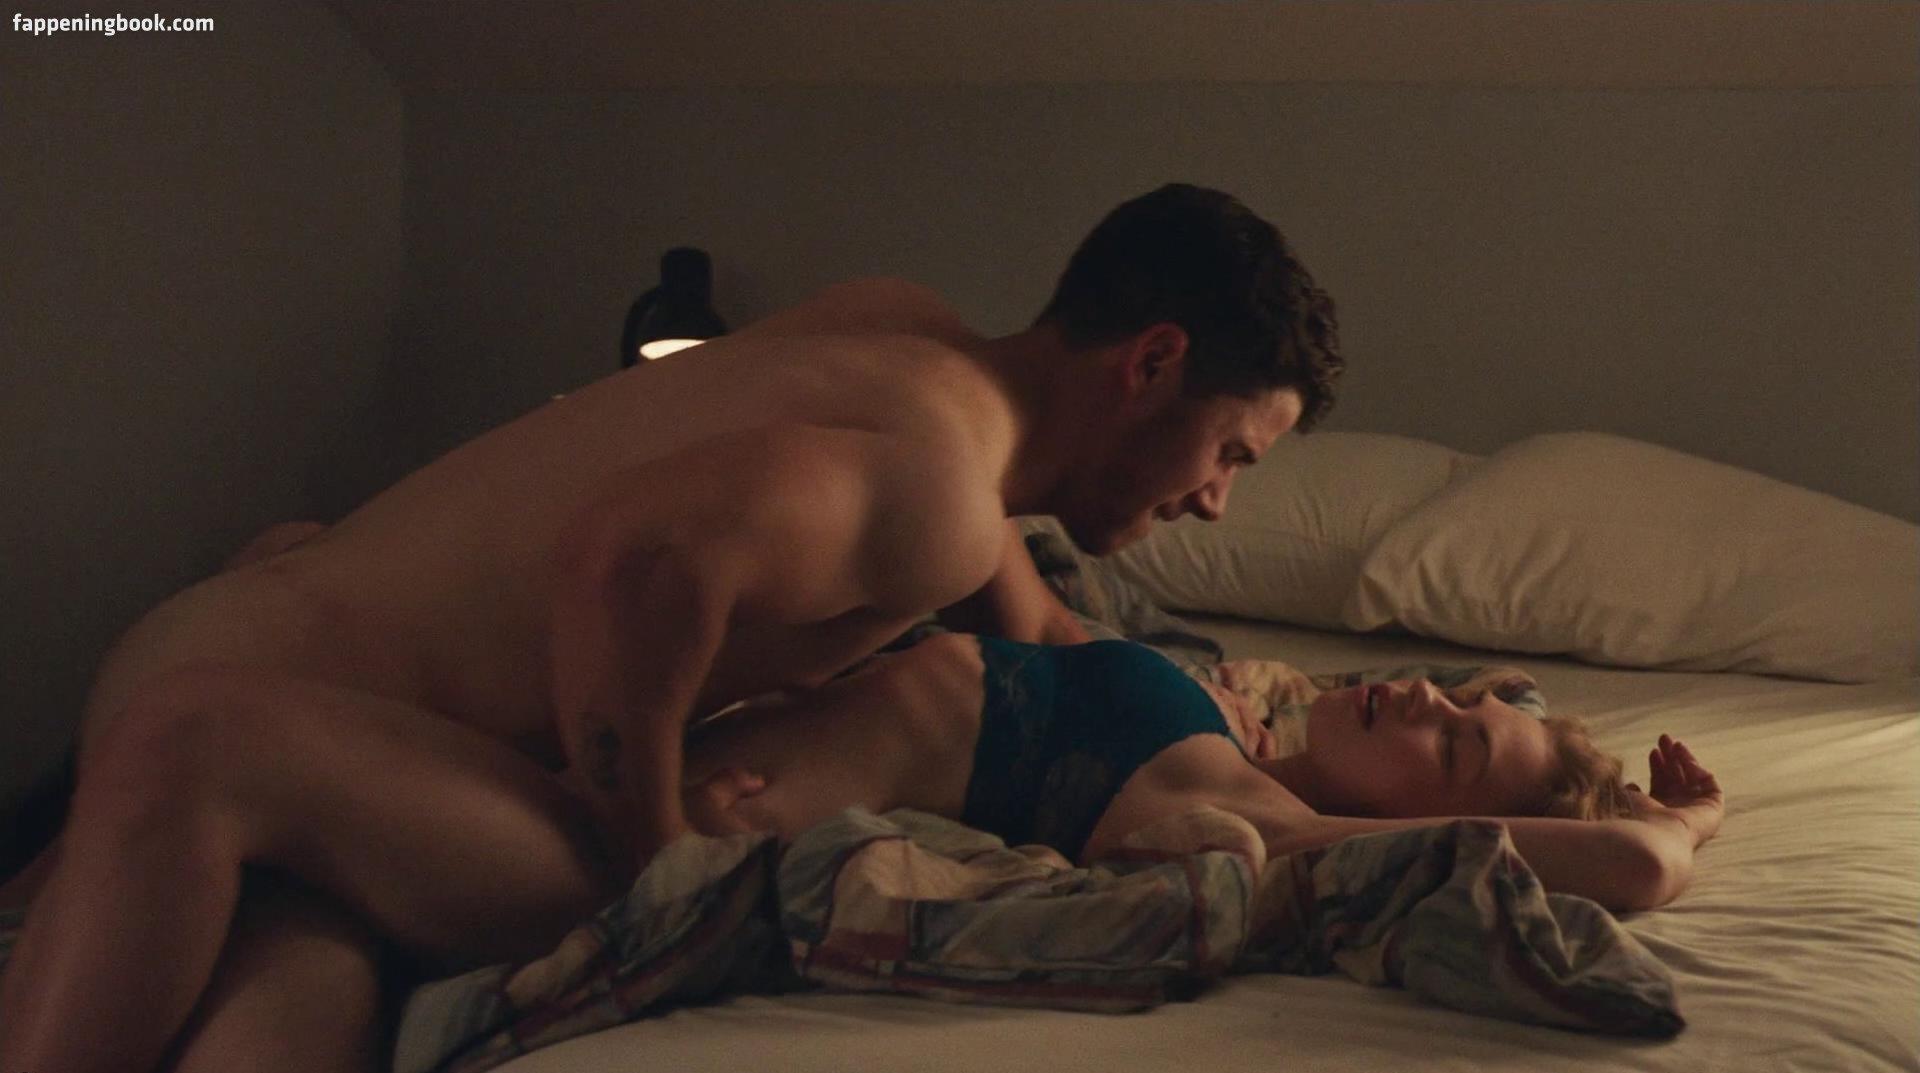 Jenny Marie Mitchell Nude